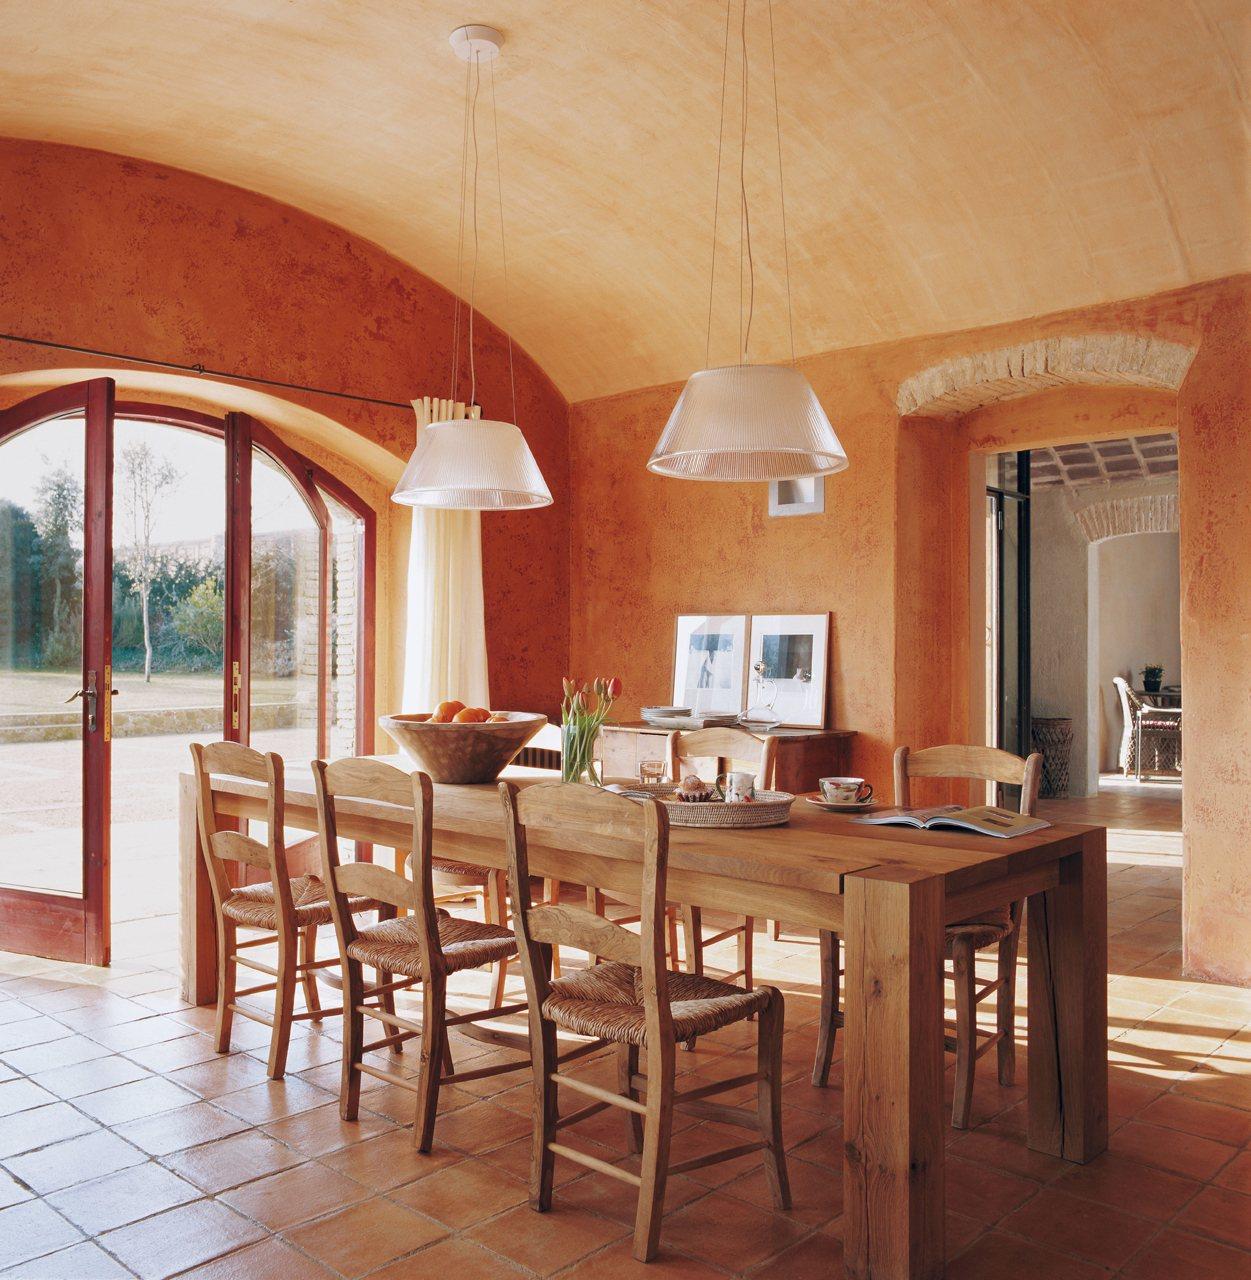 Naranja magn tico for Comedores bonitos y modernos